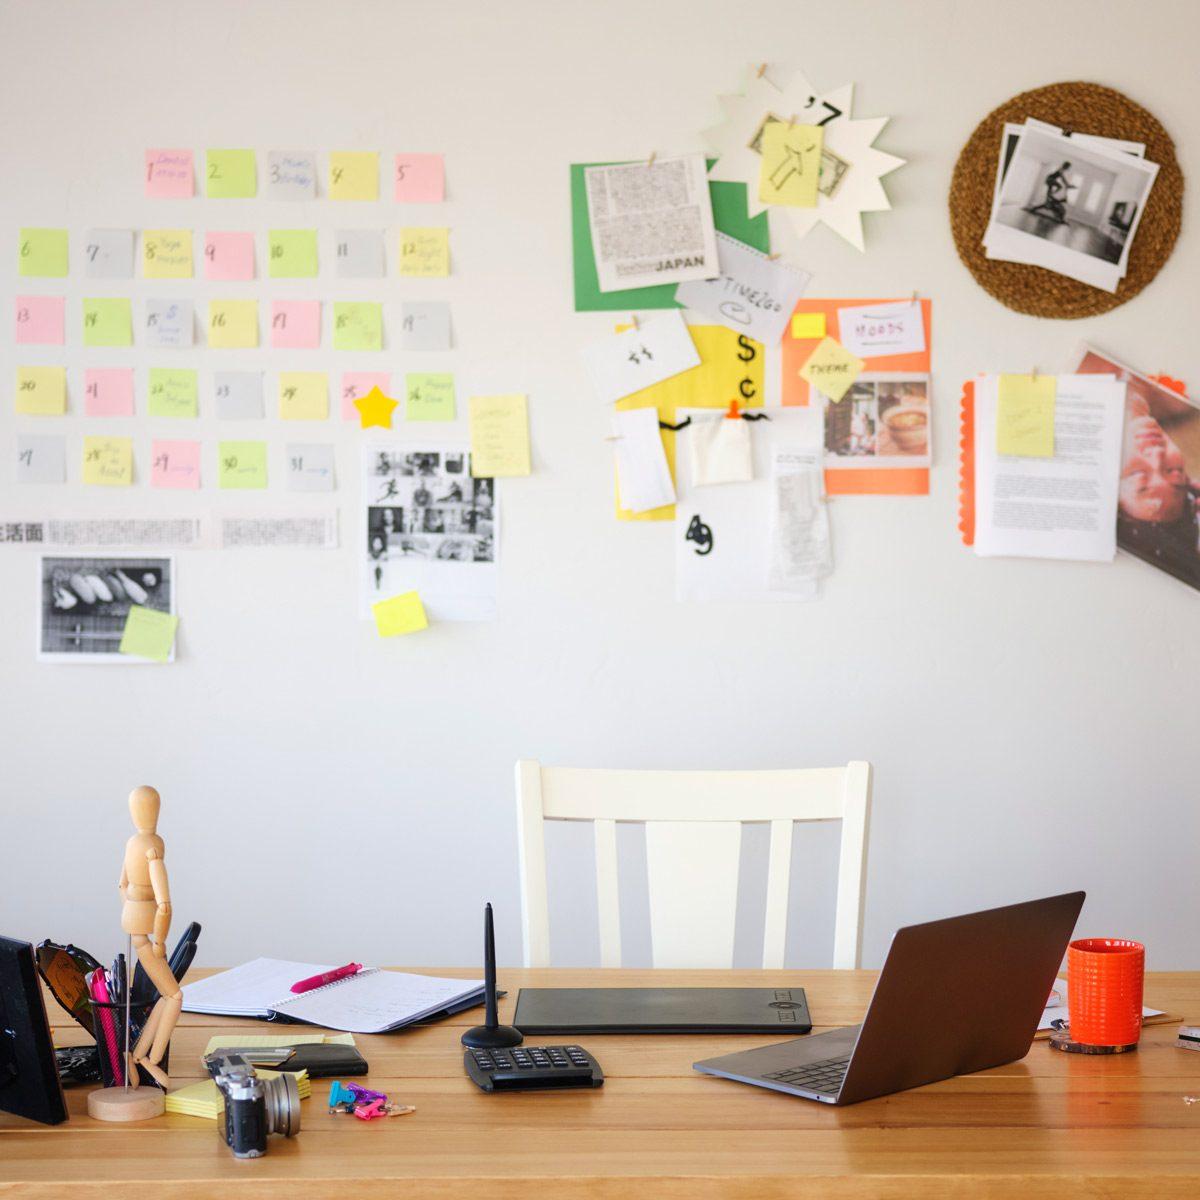 15 Easy Home Office Organization Ideas The Family Handyman